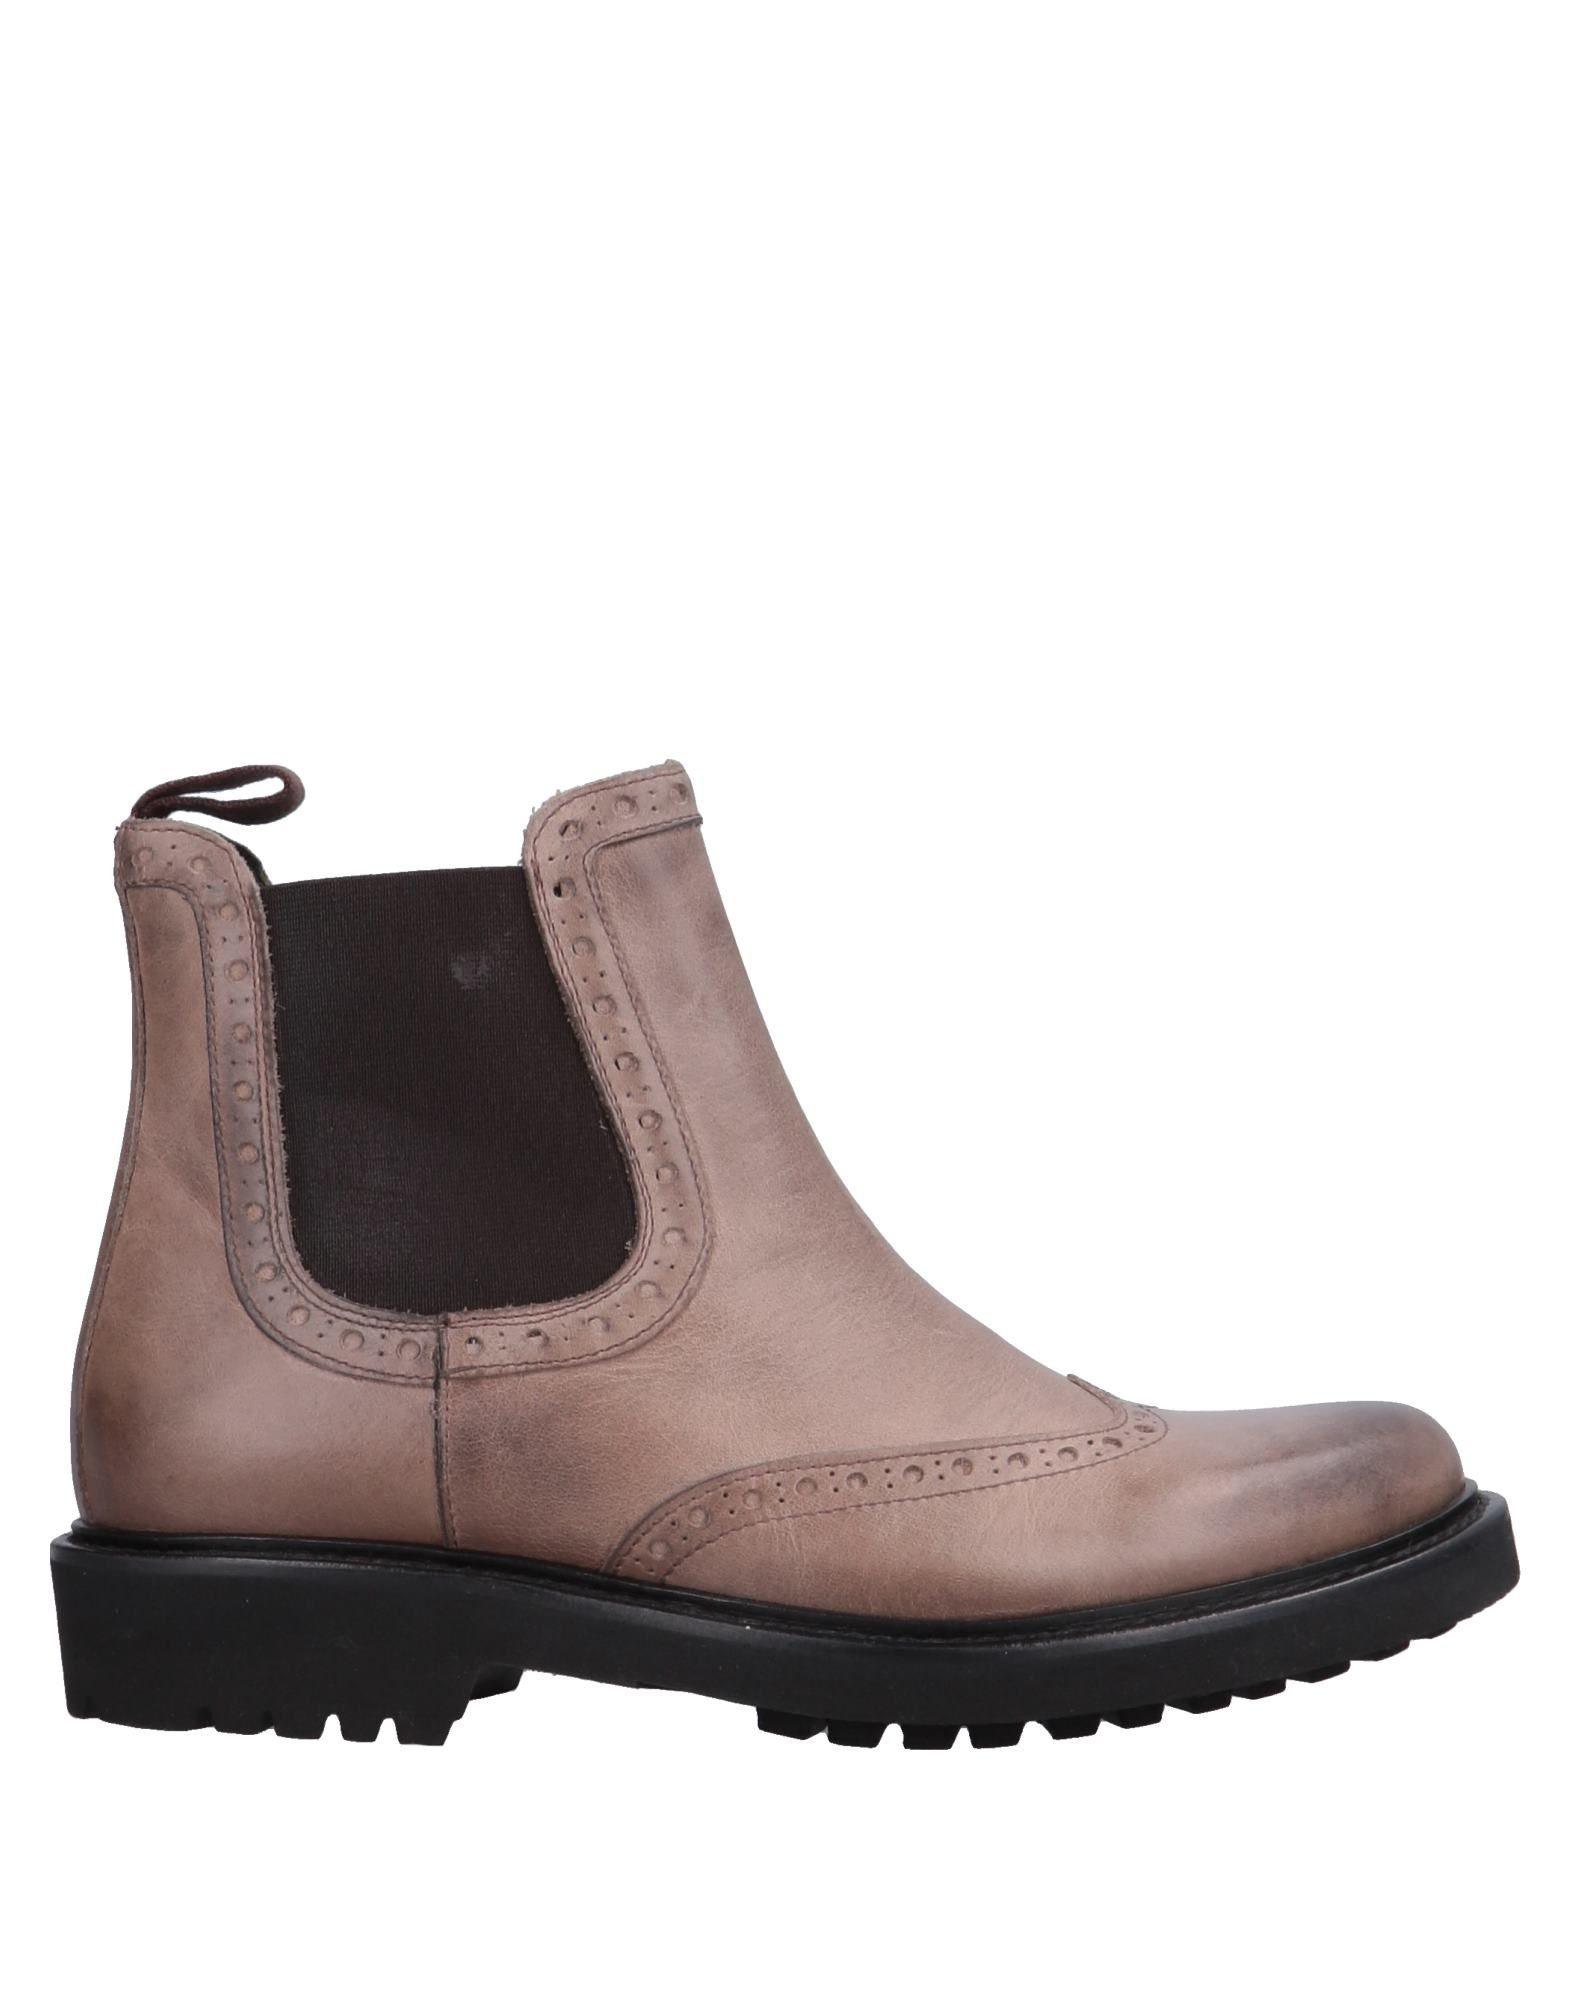 Stilvolle billige Stiefel Schuhe Seboy's Chelsea Stiefel billige Damen  11549447FM d78151